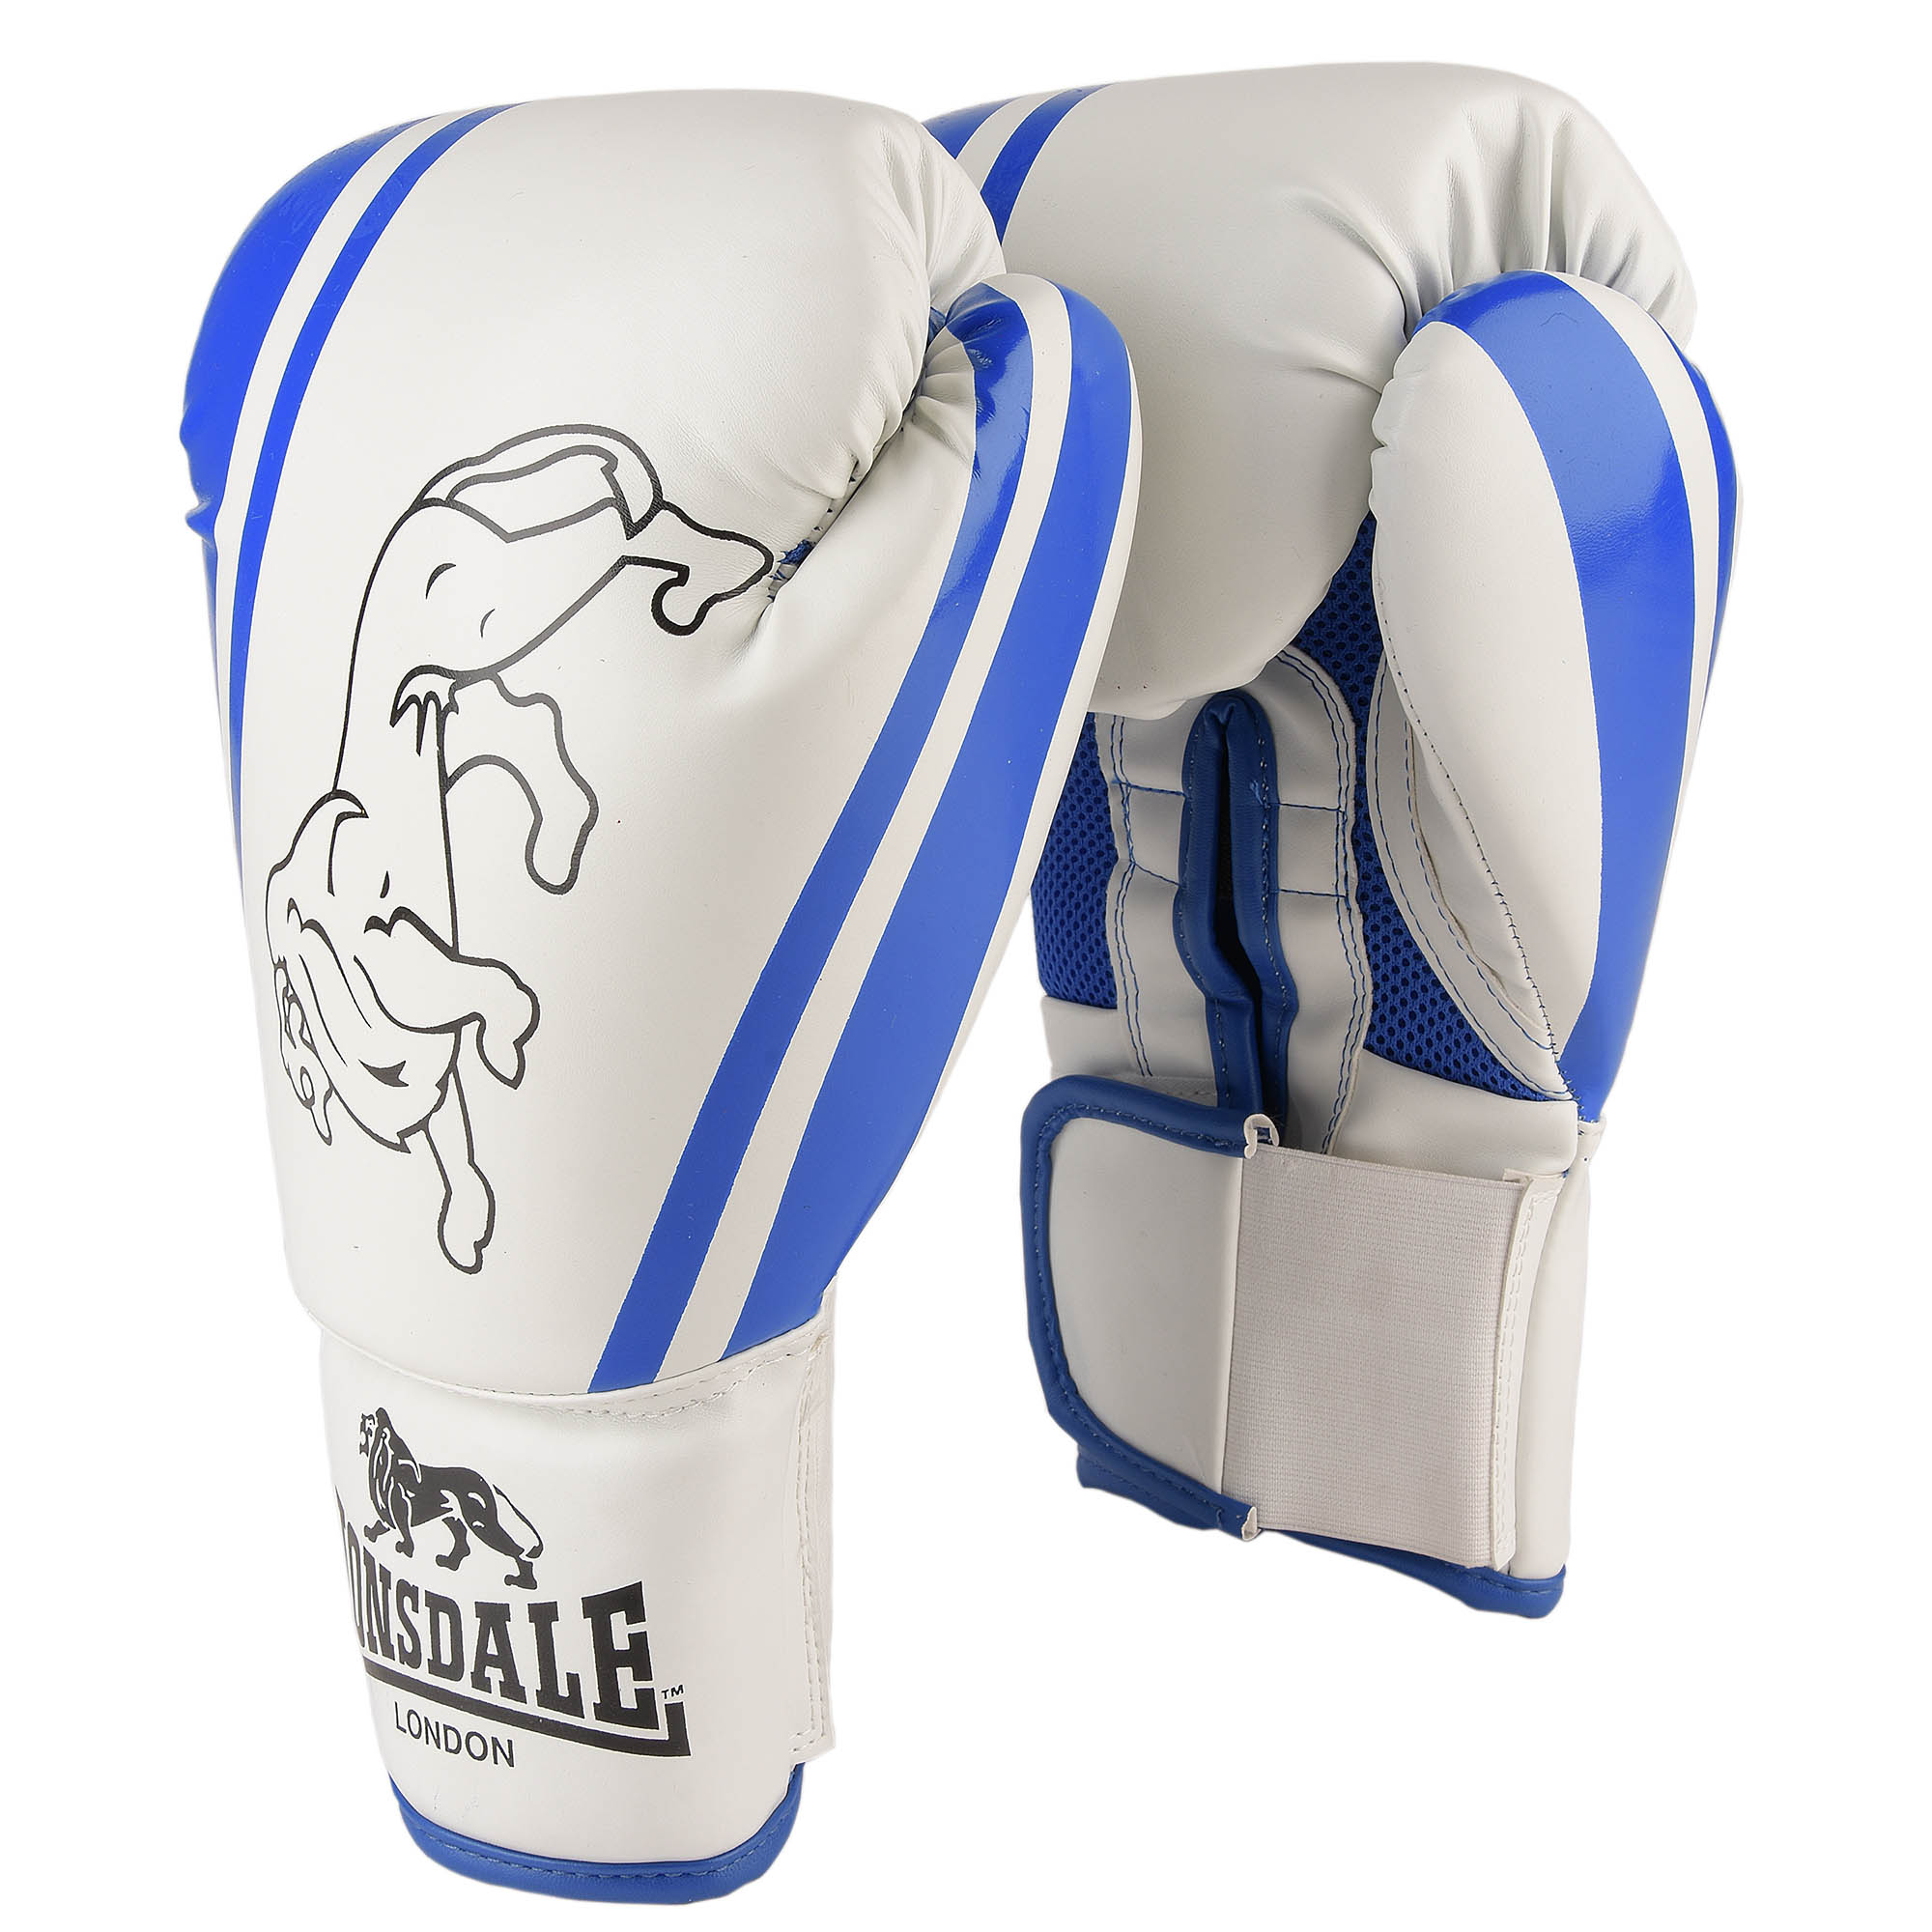 Lonsdale Club Training Gloves - White/Blue, 12oz